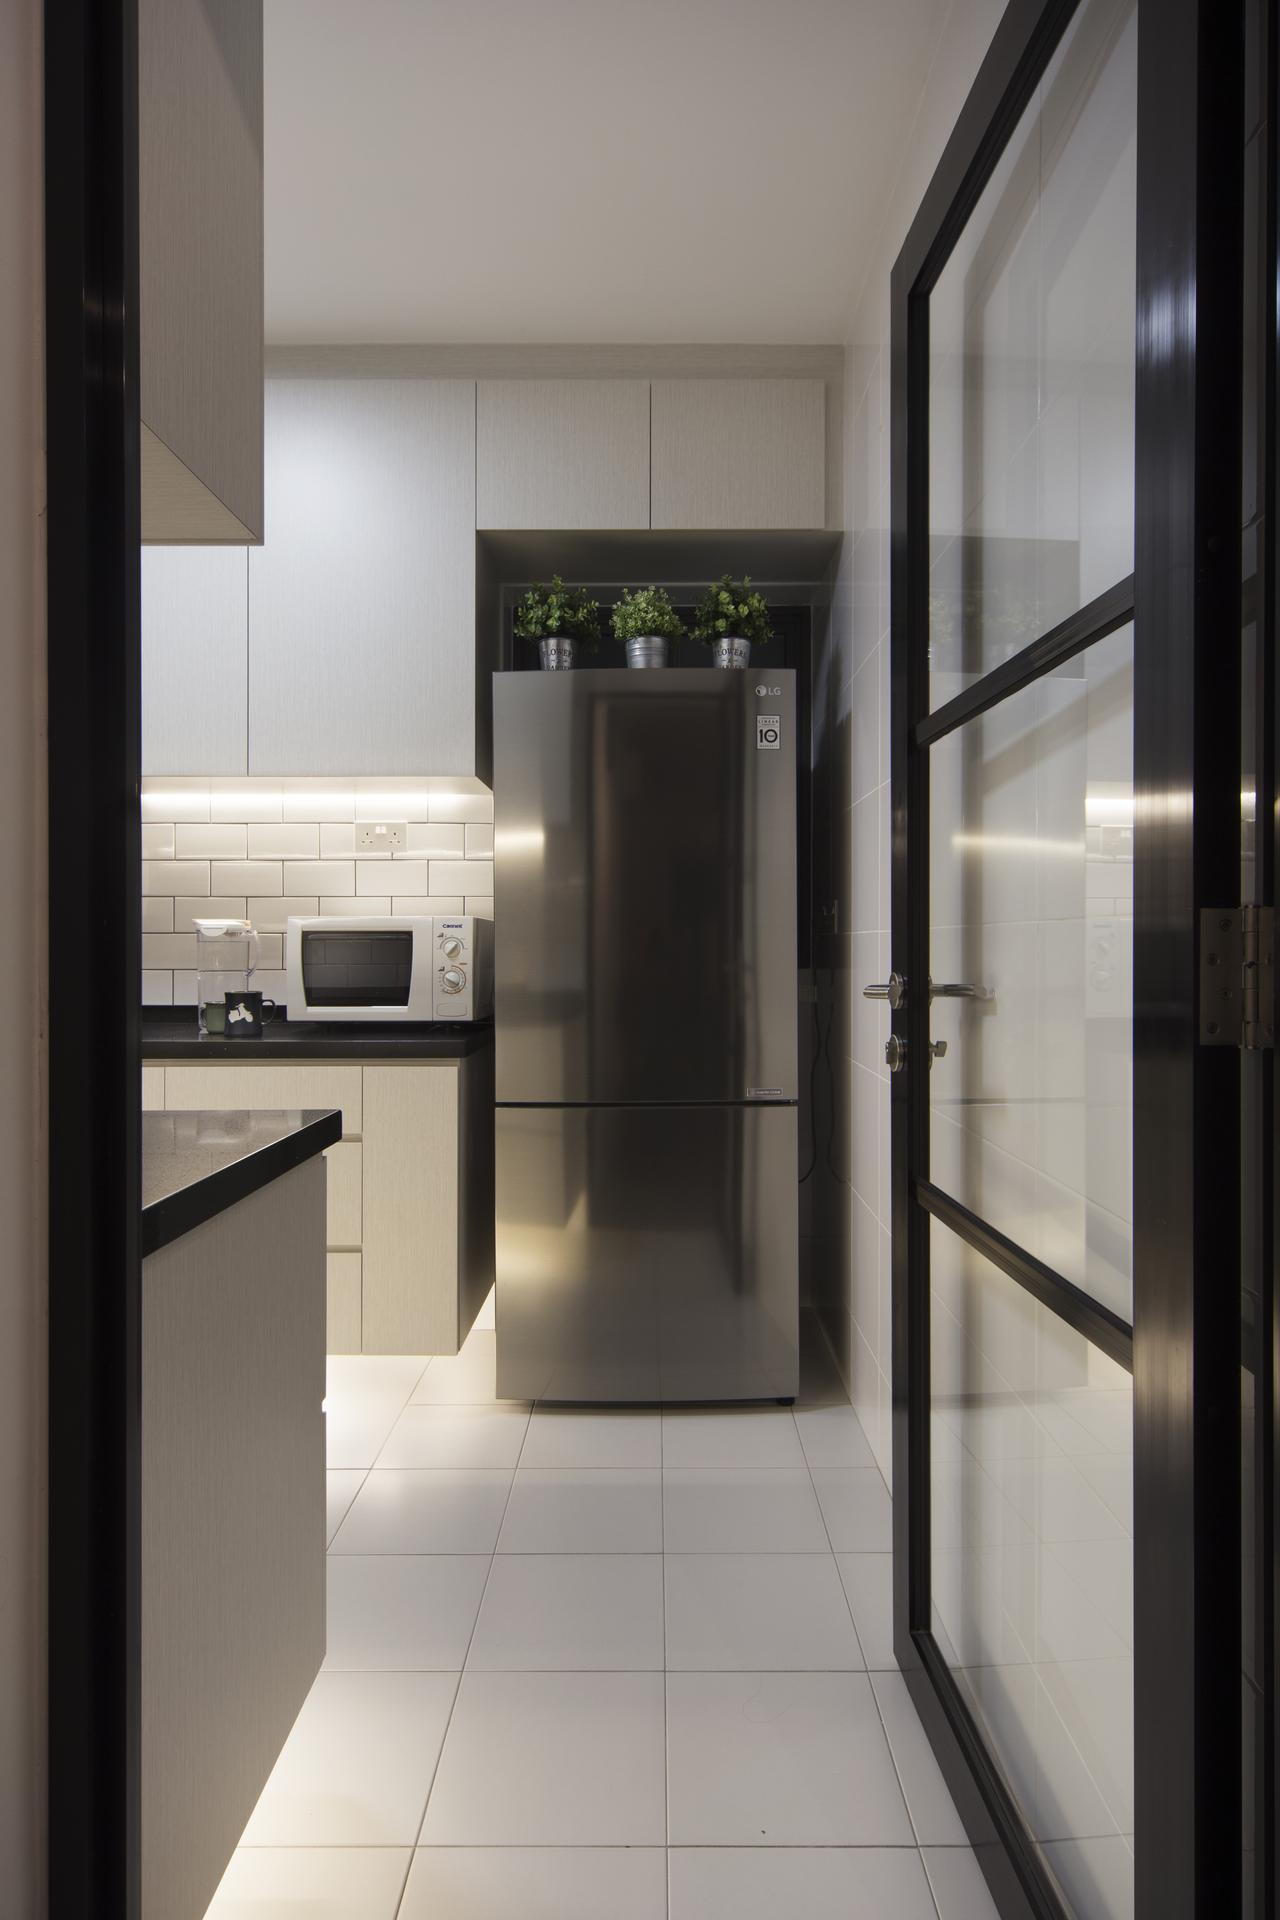 Space concepts interior design 6 home renovation singapore for Interior designs concepts